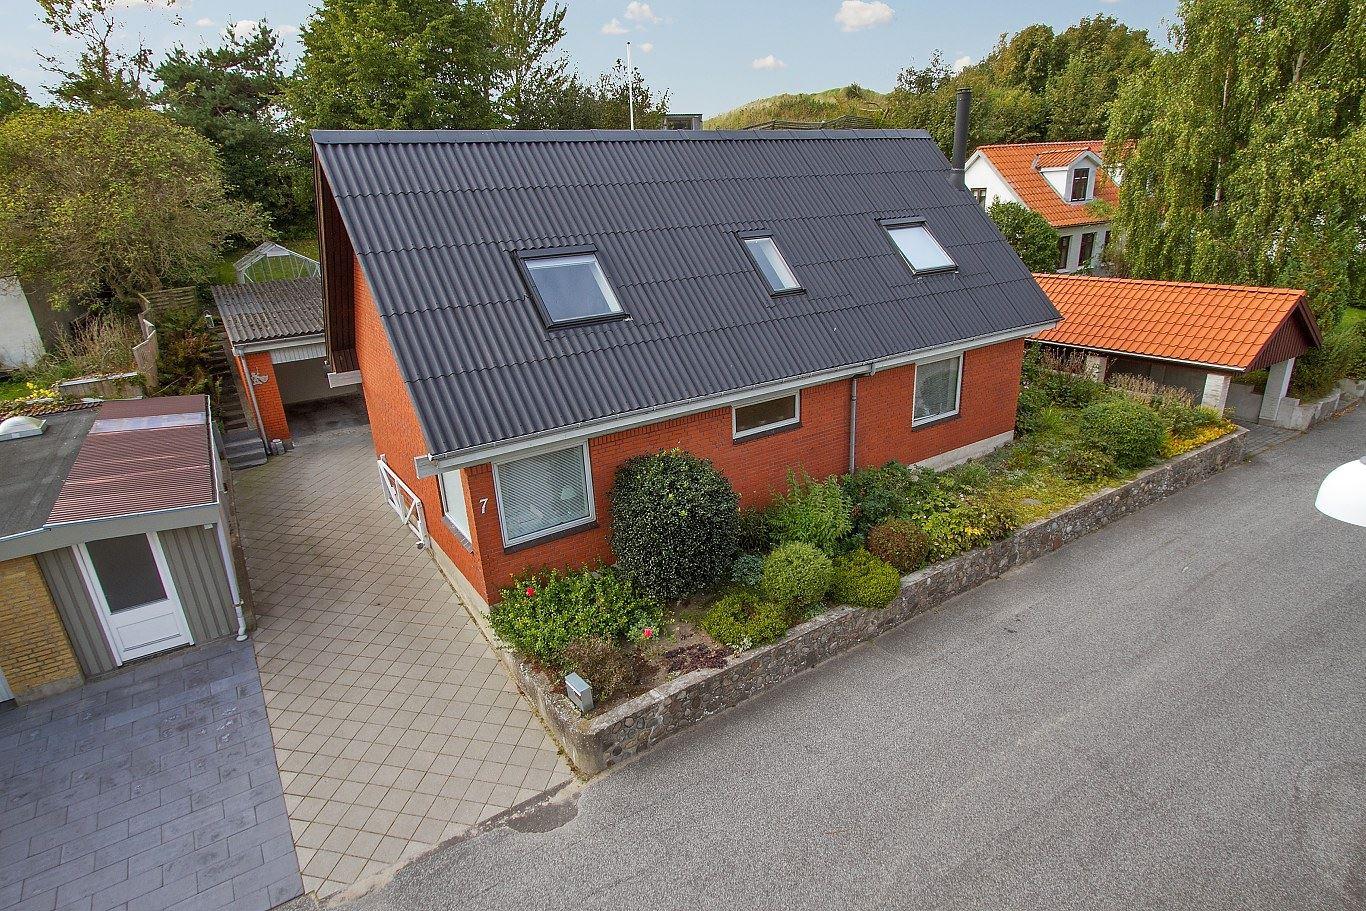 Morgenvej 7, Øster Sundby, 9220 Aalborg Øst